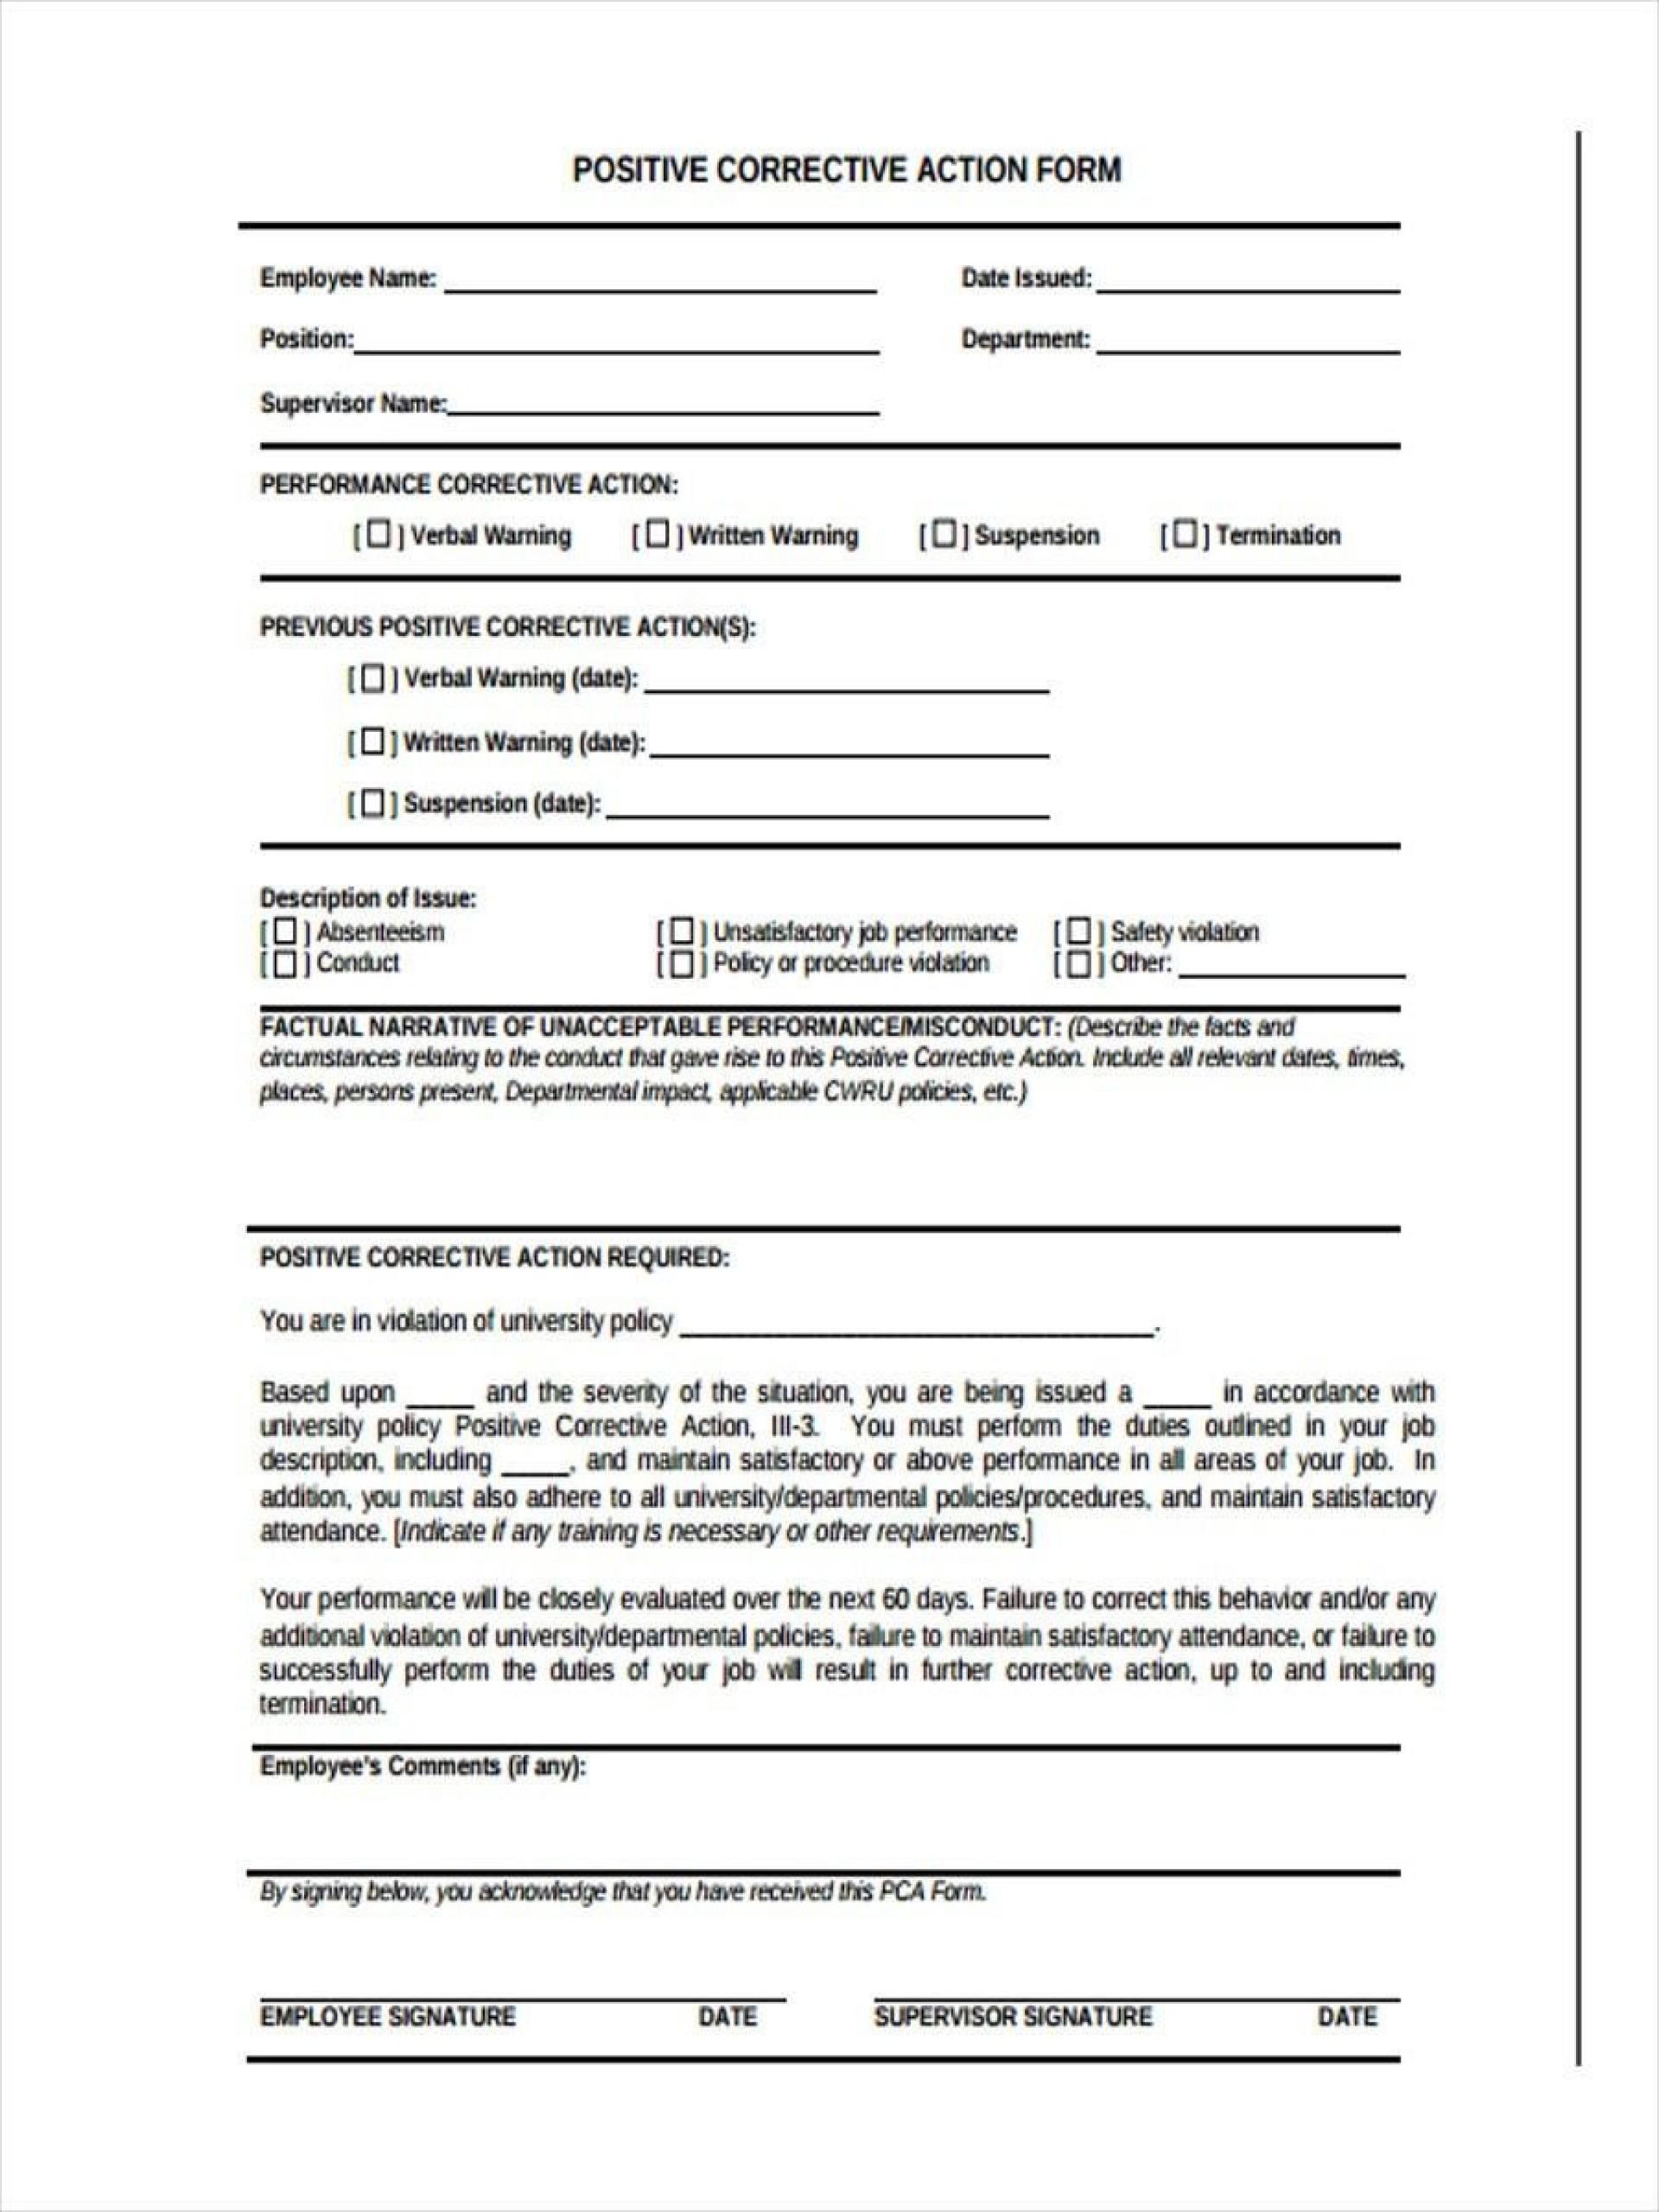 008 Wonderful Corrective Action Report Template Image  Doc 8d Format Pdf1920